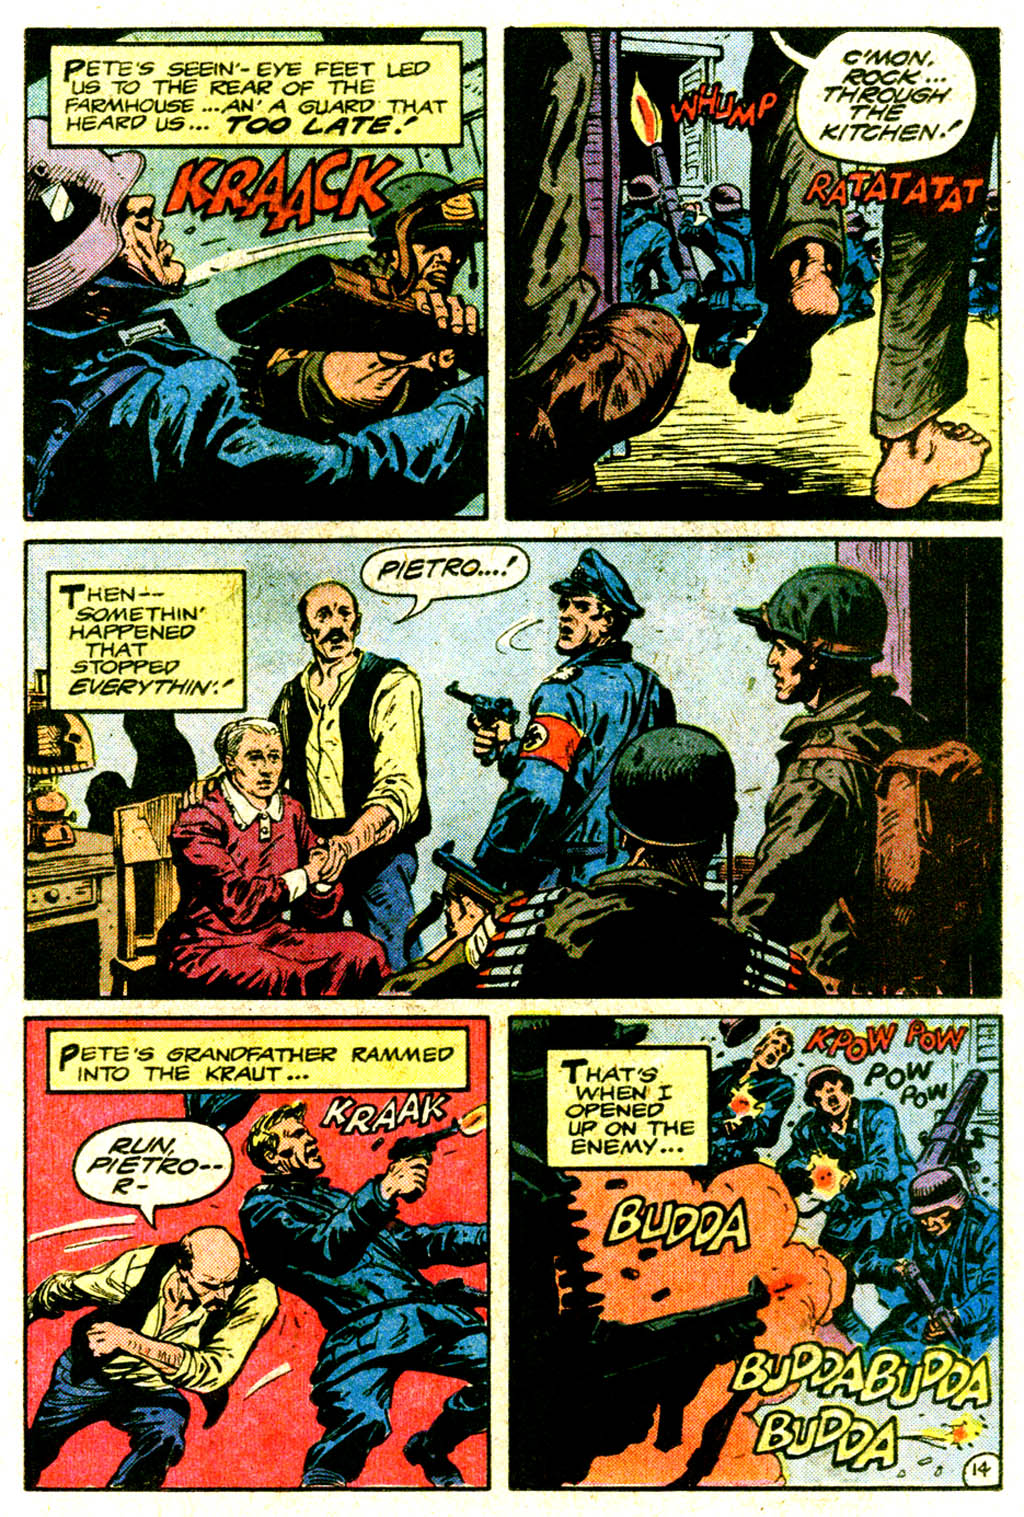 Read online Sgt. Rock comic -  Issue #364 - 18